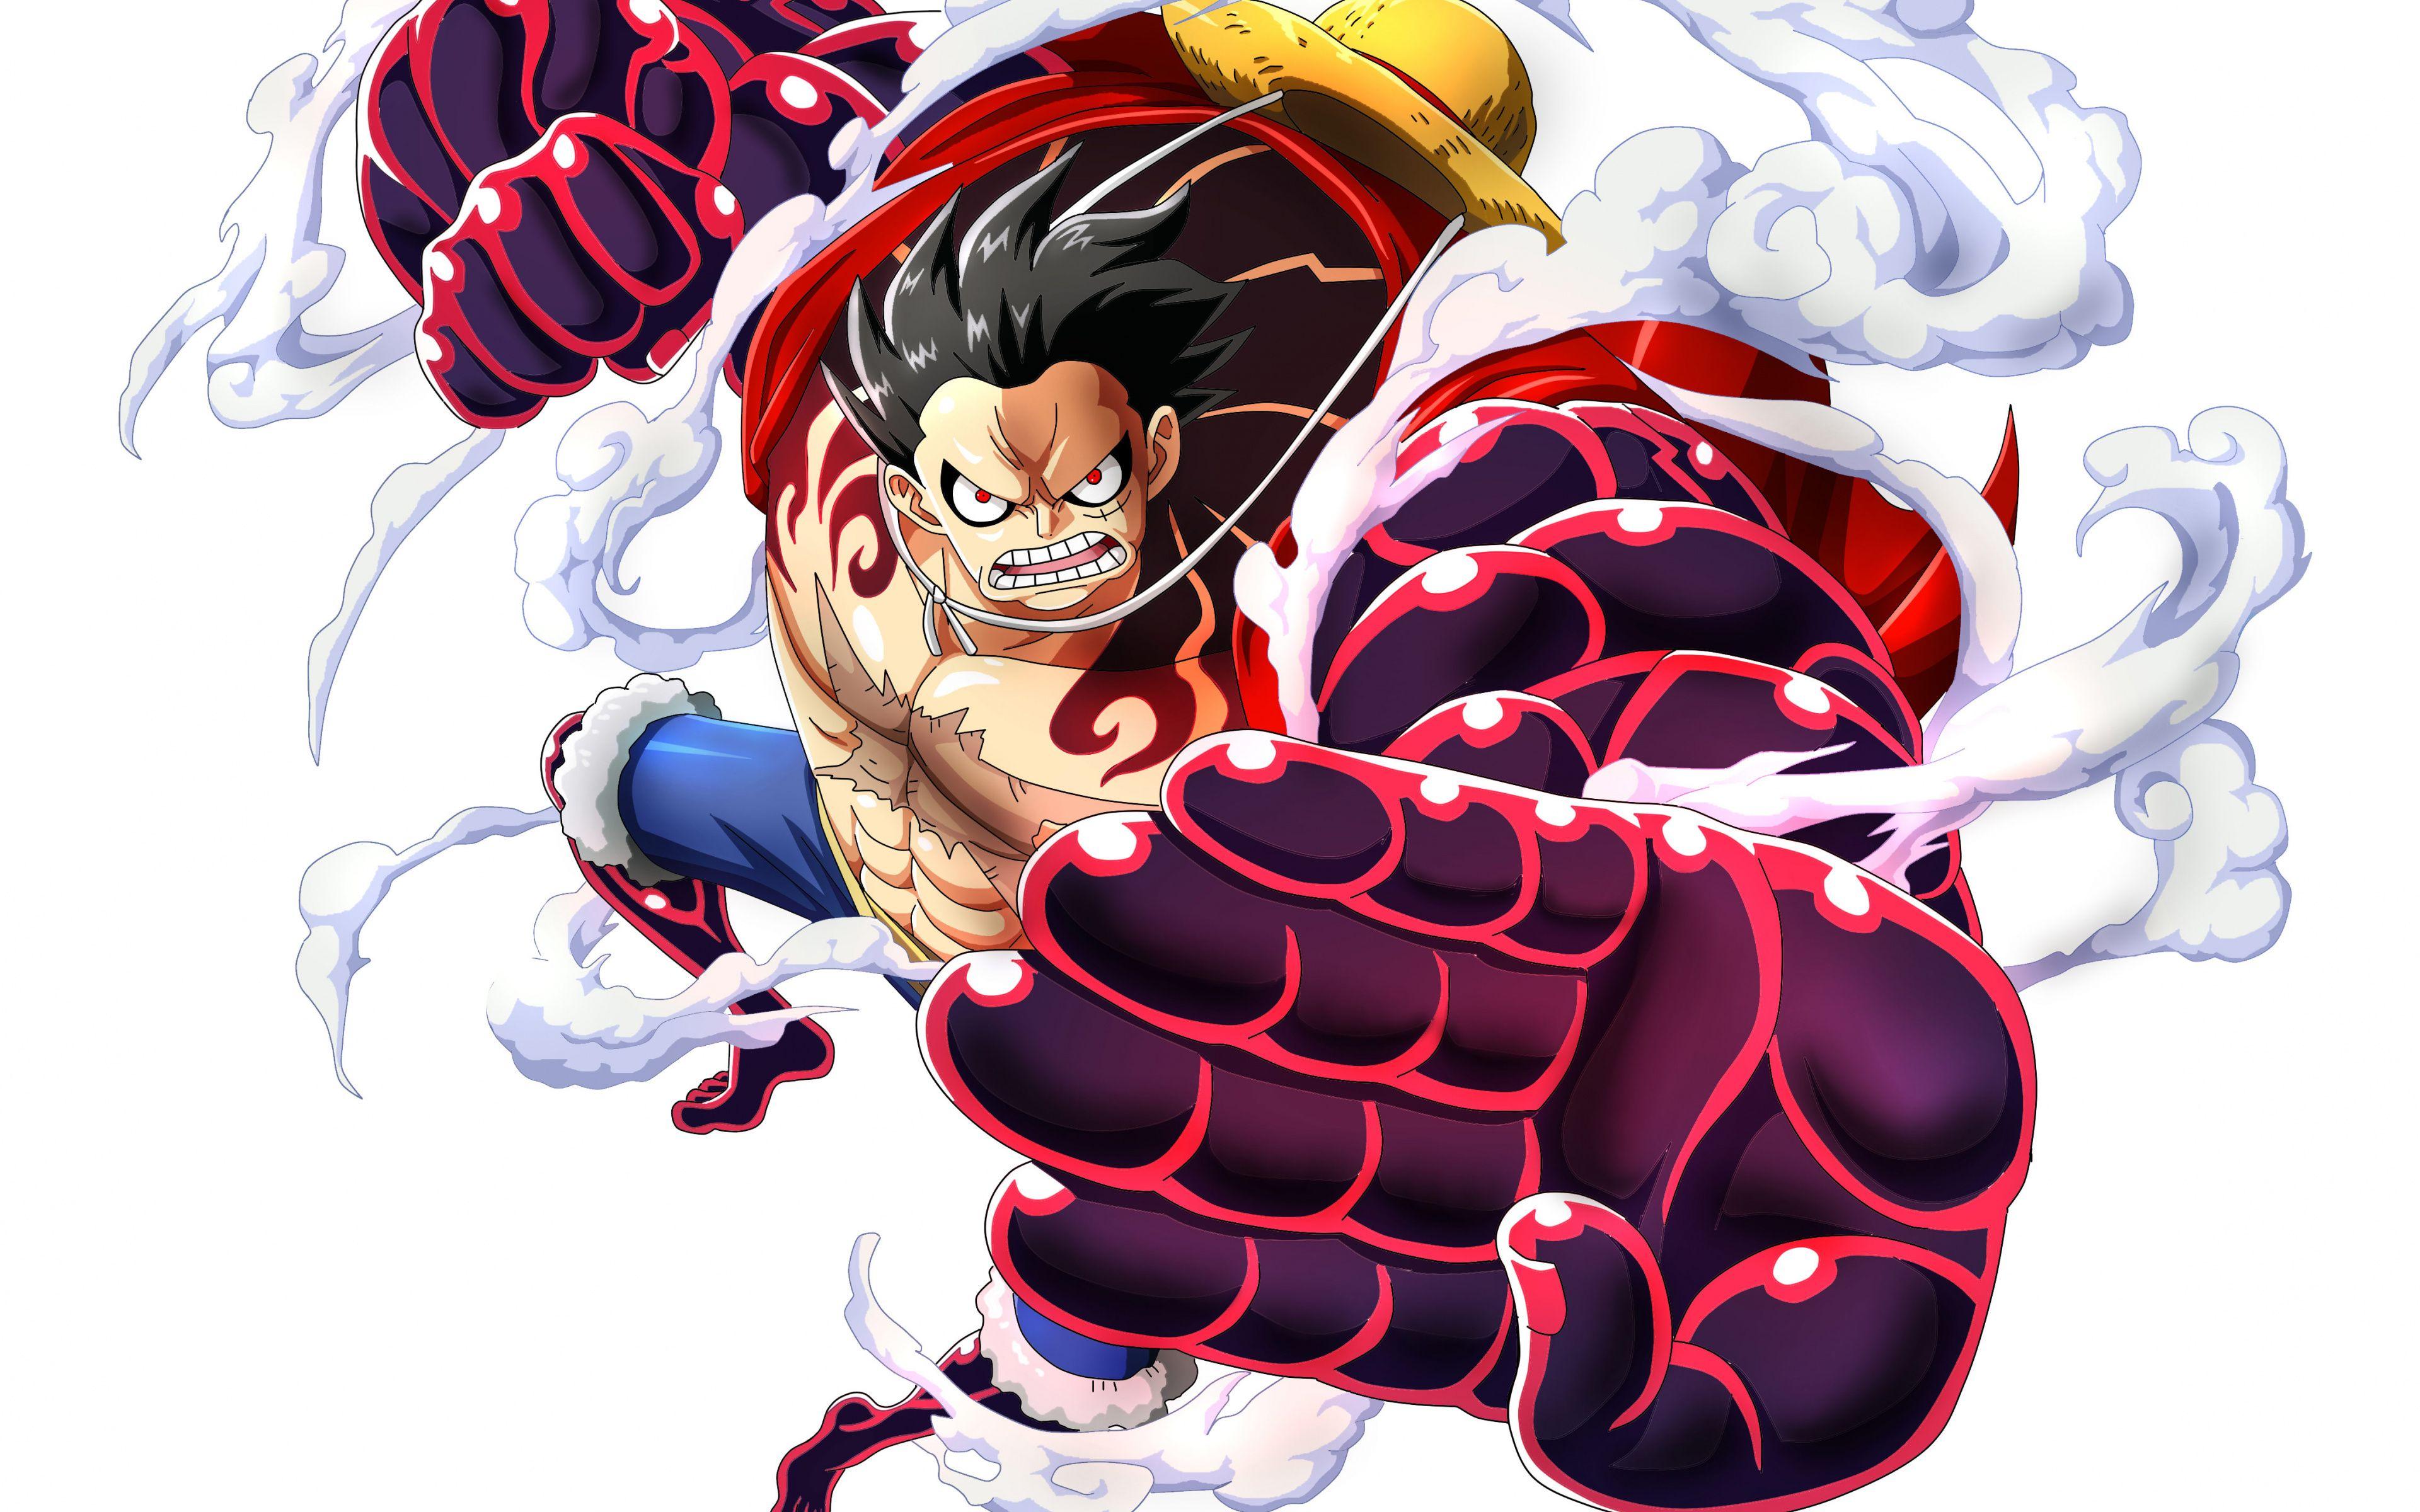 Download 3840x2400 Wallpaper Monkey D Luffy One Piece Anime Boy Punch 4 K Ultra Hd 16 10 Widescreen 3840x Luffy Gear 4 One Piece Luffy One Piece Gear 4